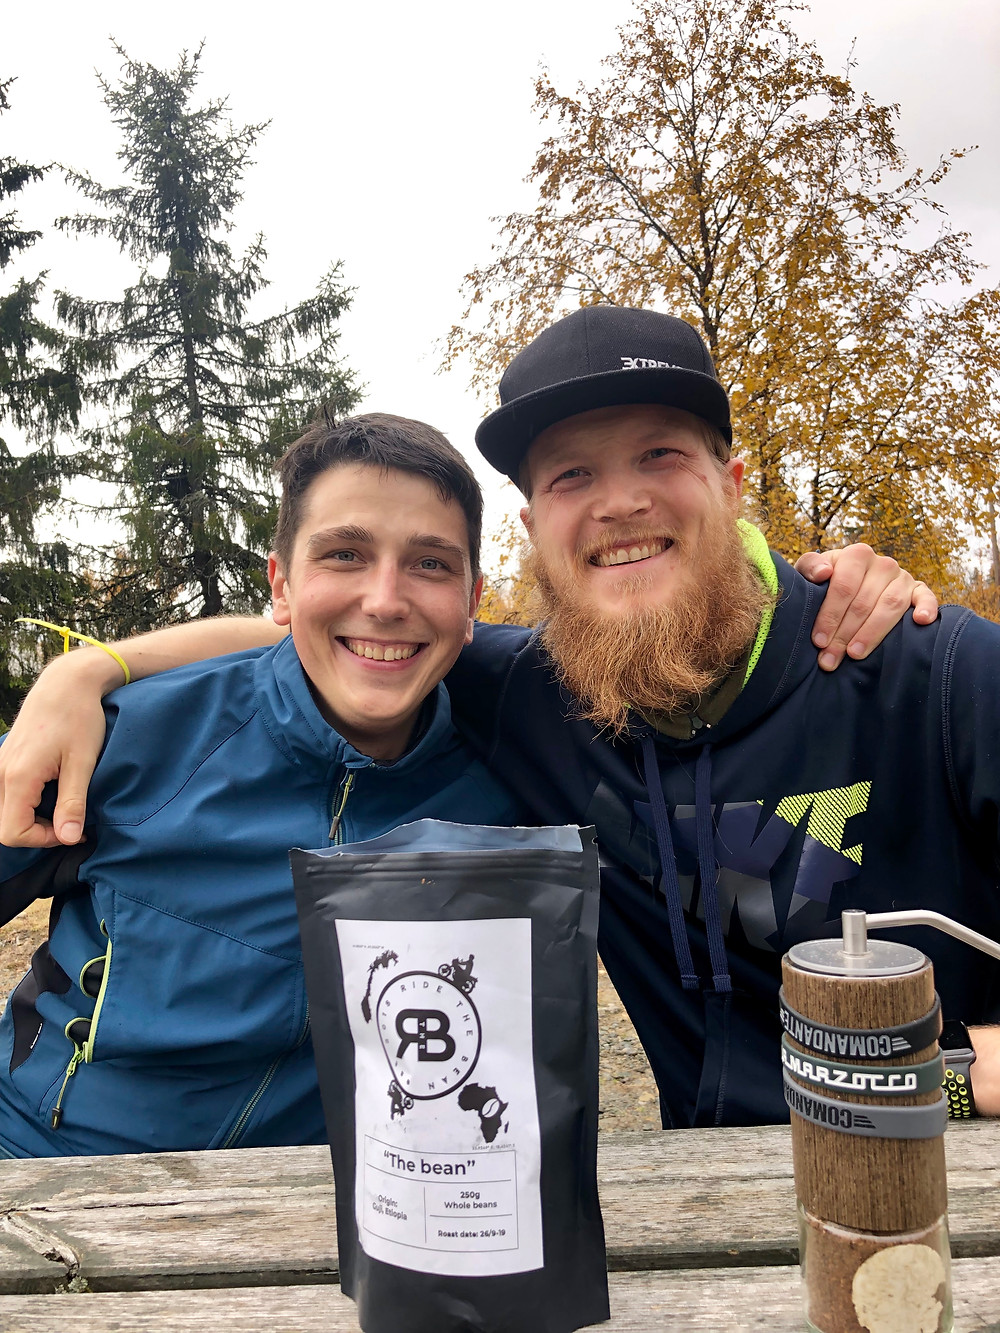 Josef & Kenneth | Ride the Bean | The Bean | Rondane